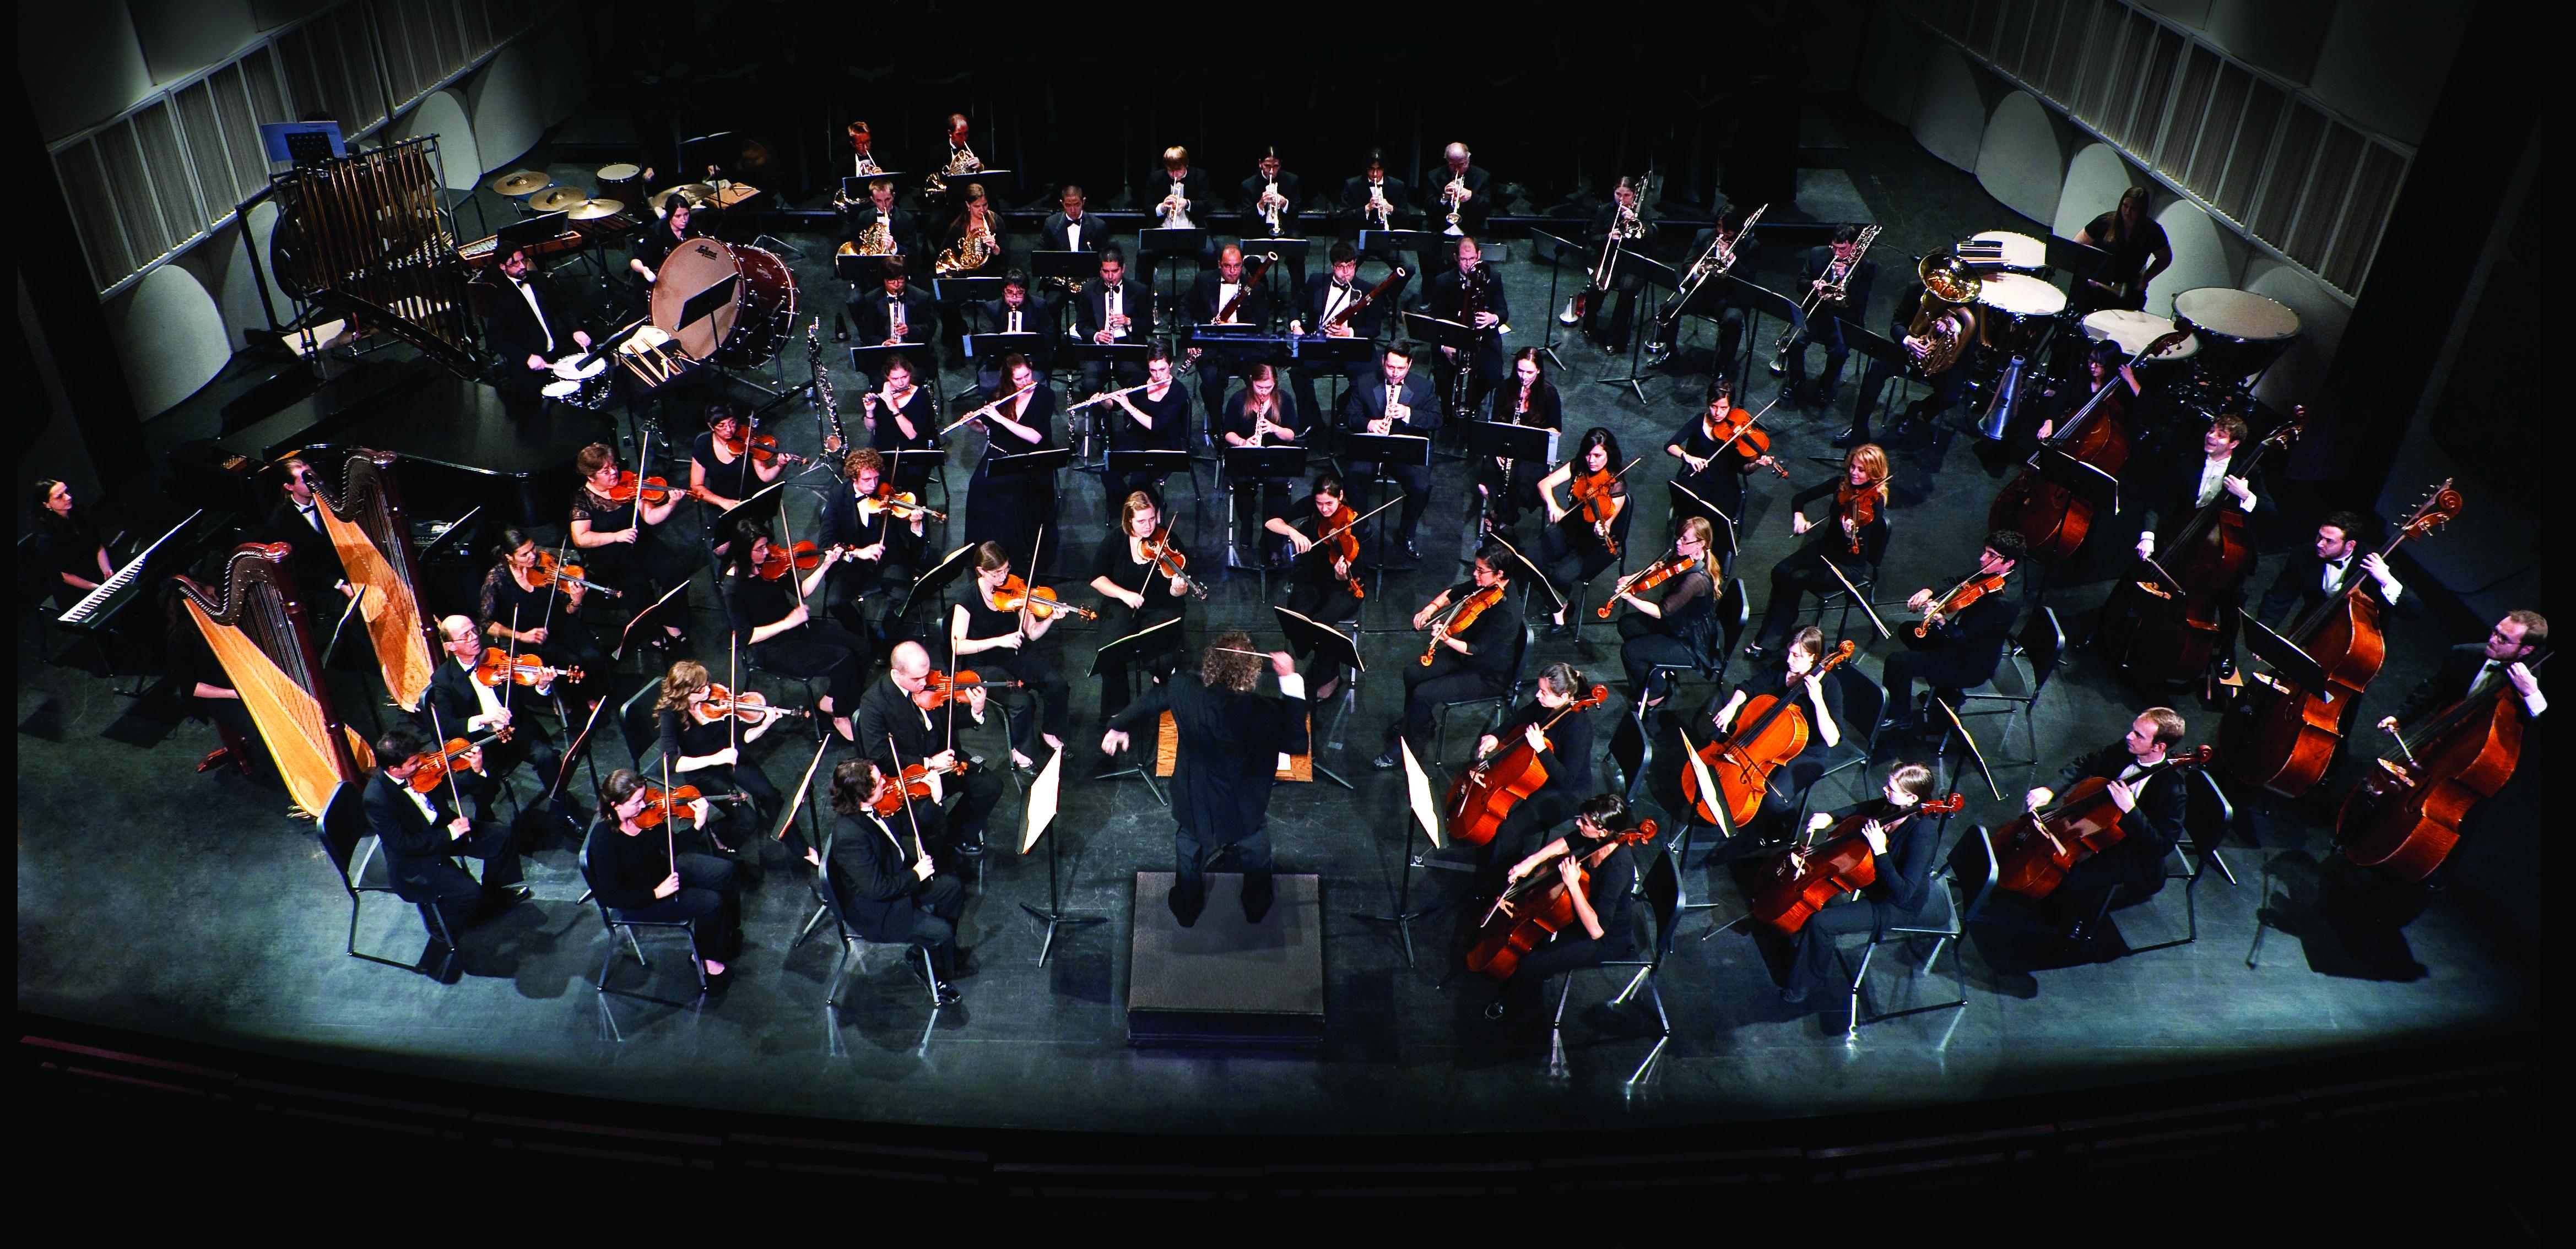 an analysis of binghamton symphony orchestra Graduates of lawrence university  economics, statistics, nonprofits, banking, analysis, financial analysis  indianapolis symphony orchestra performing.